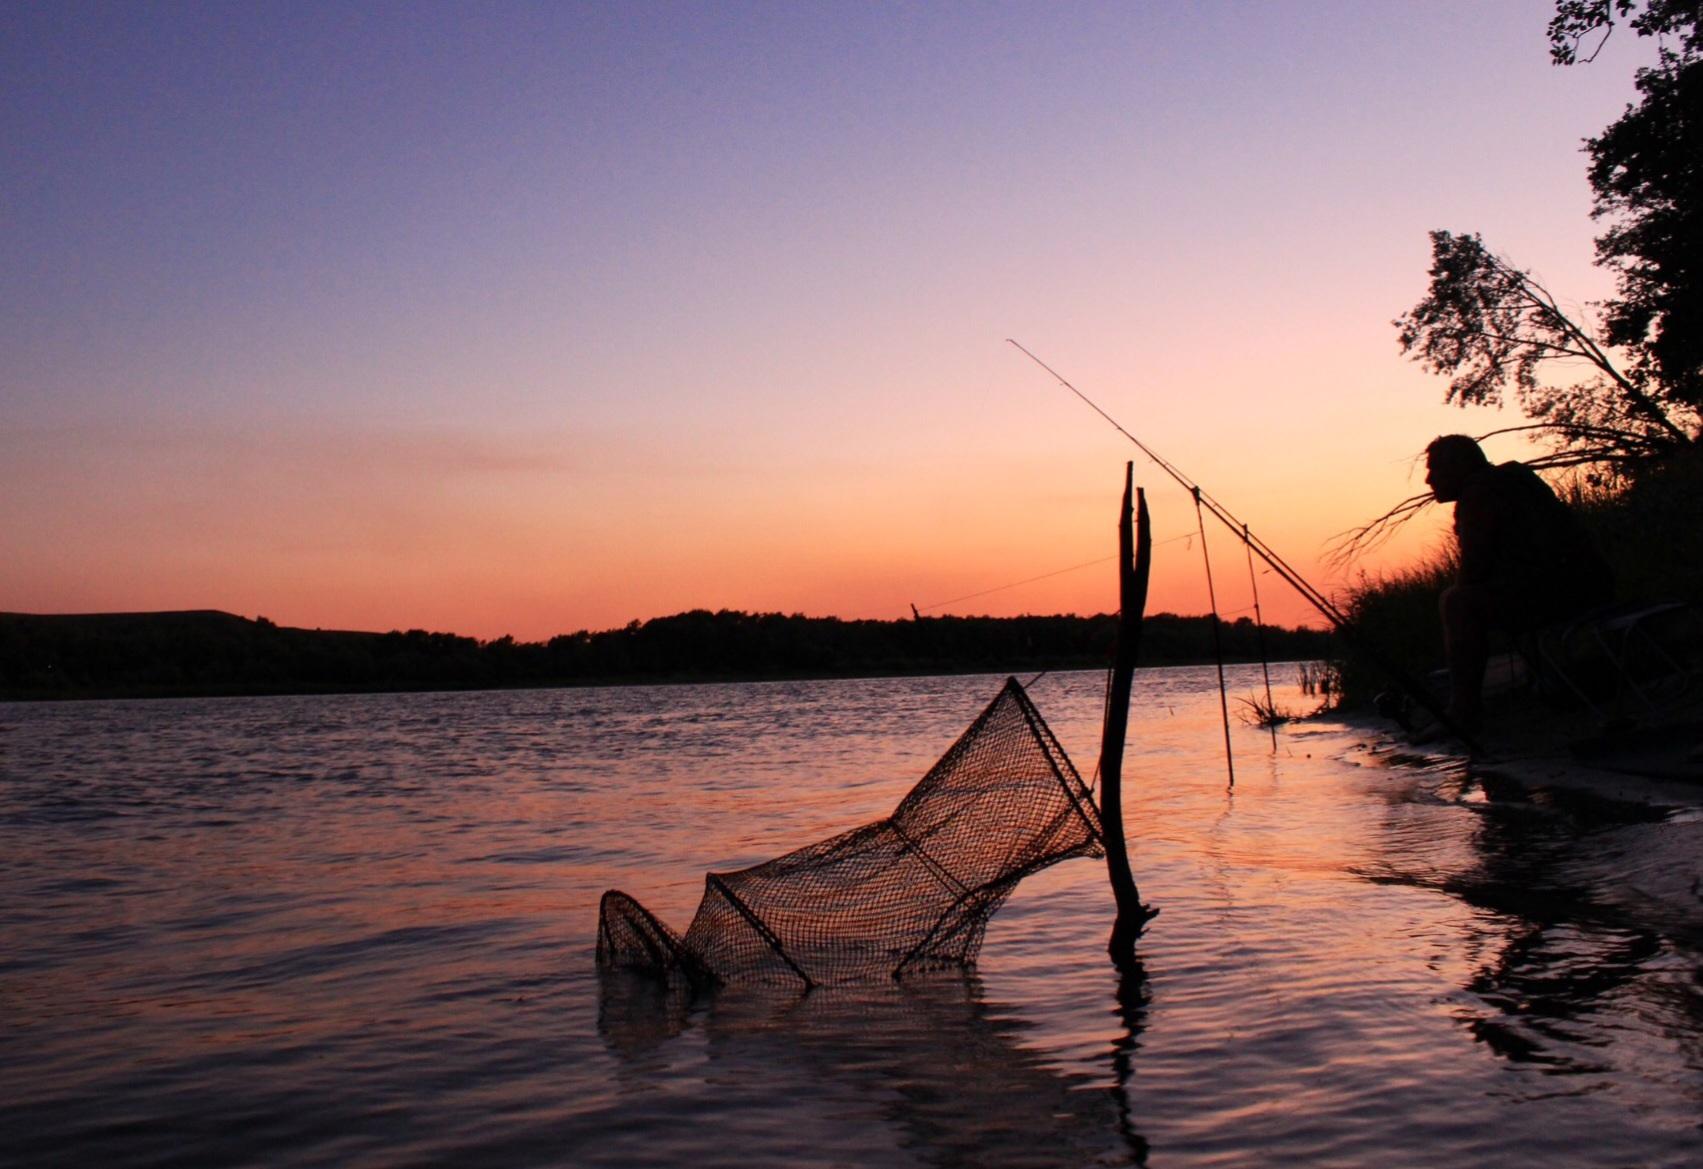 картинки рыбаки на природе